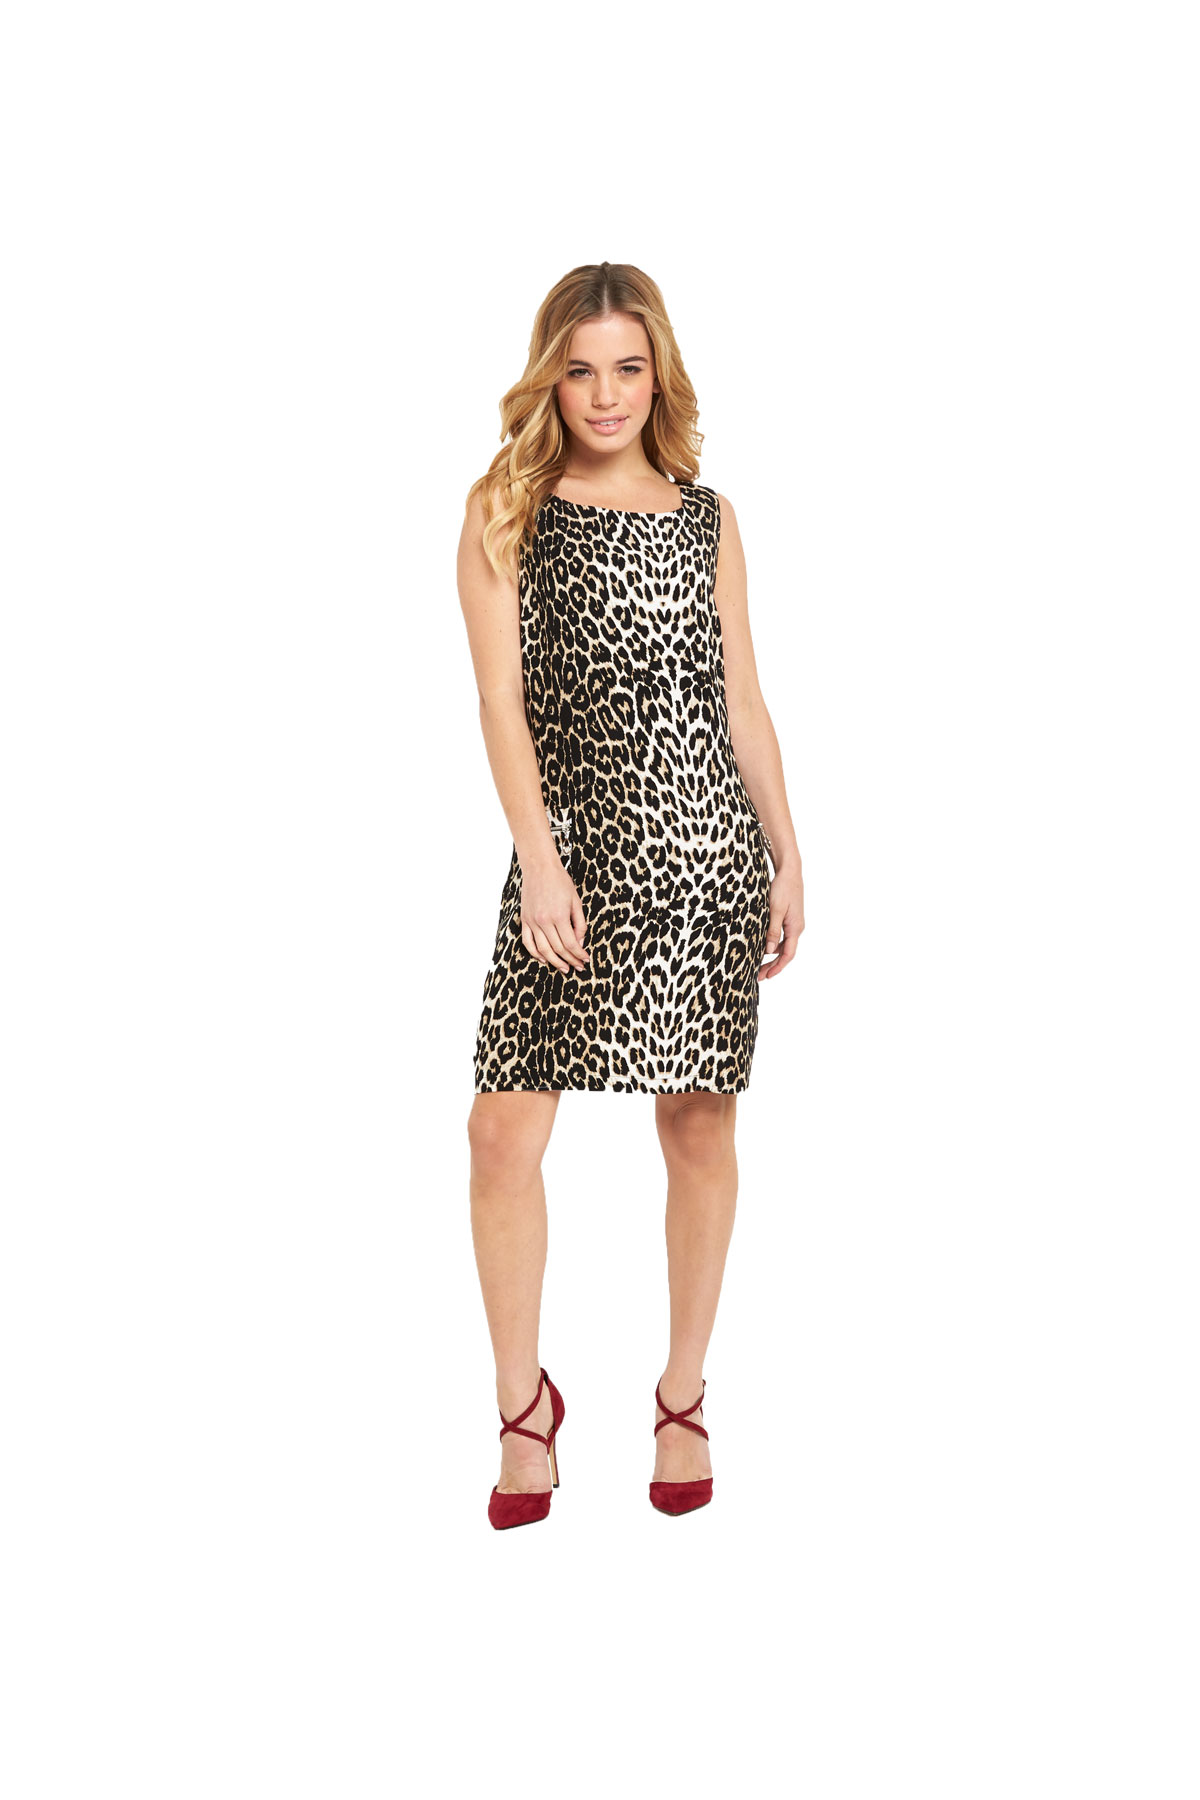 Wallis Petite Animal Shift Dress.